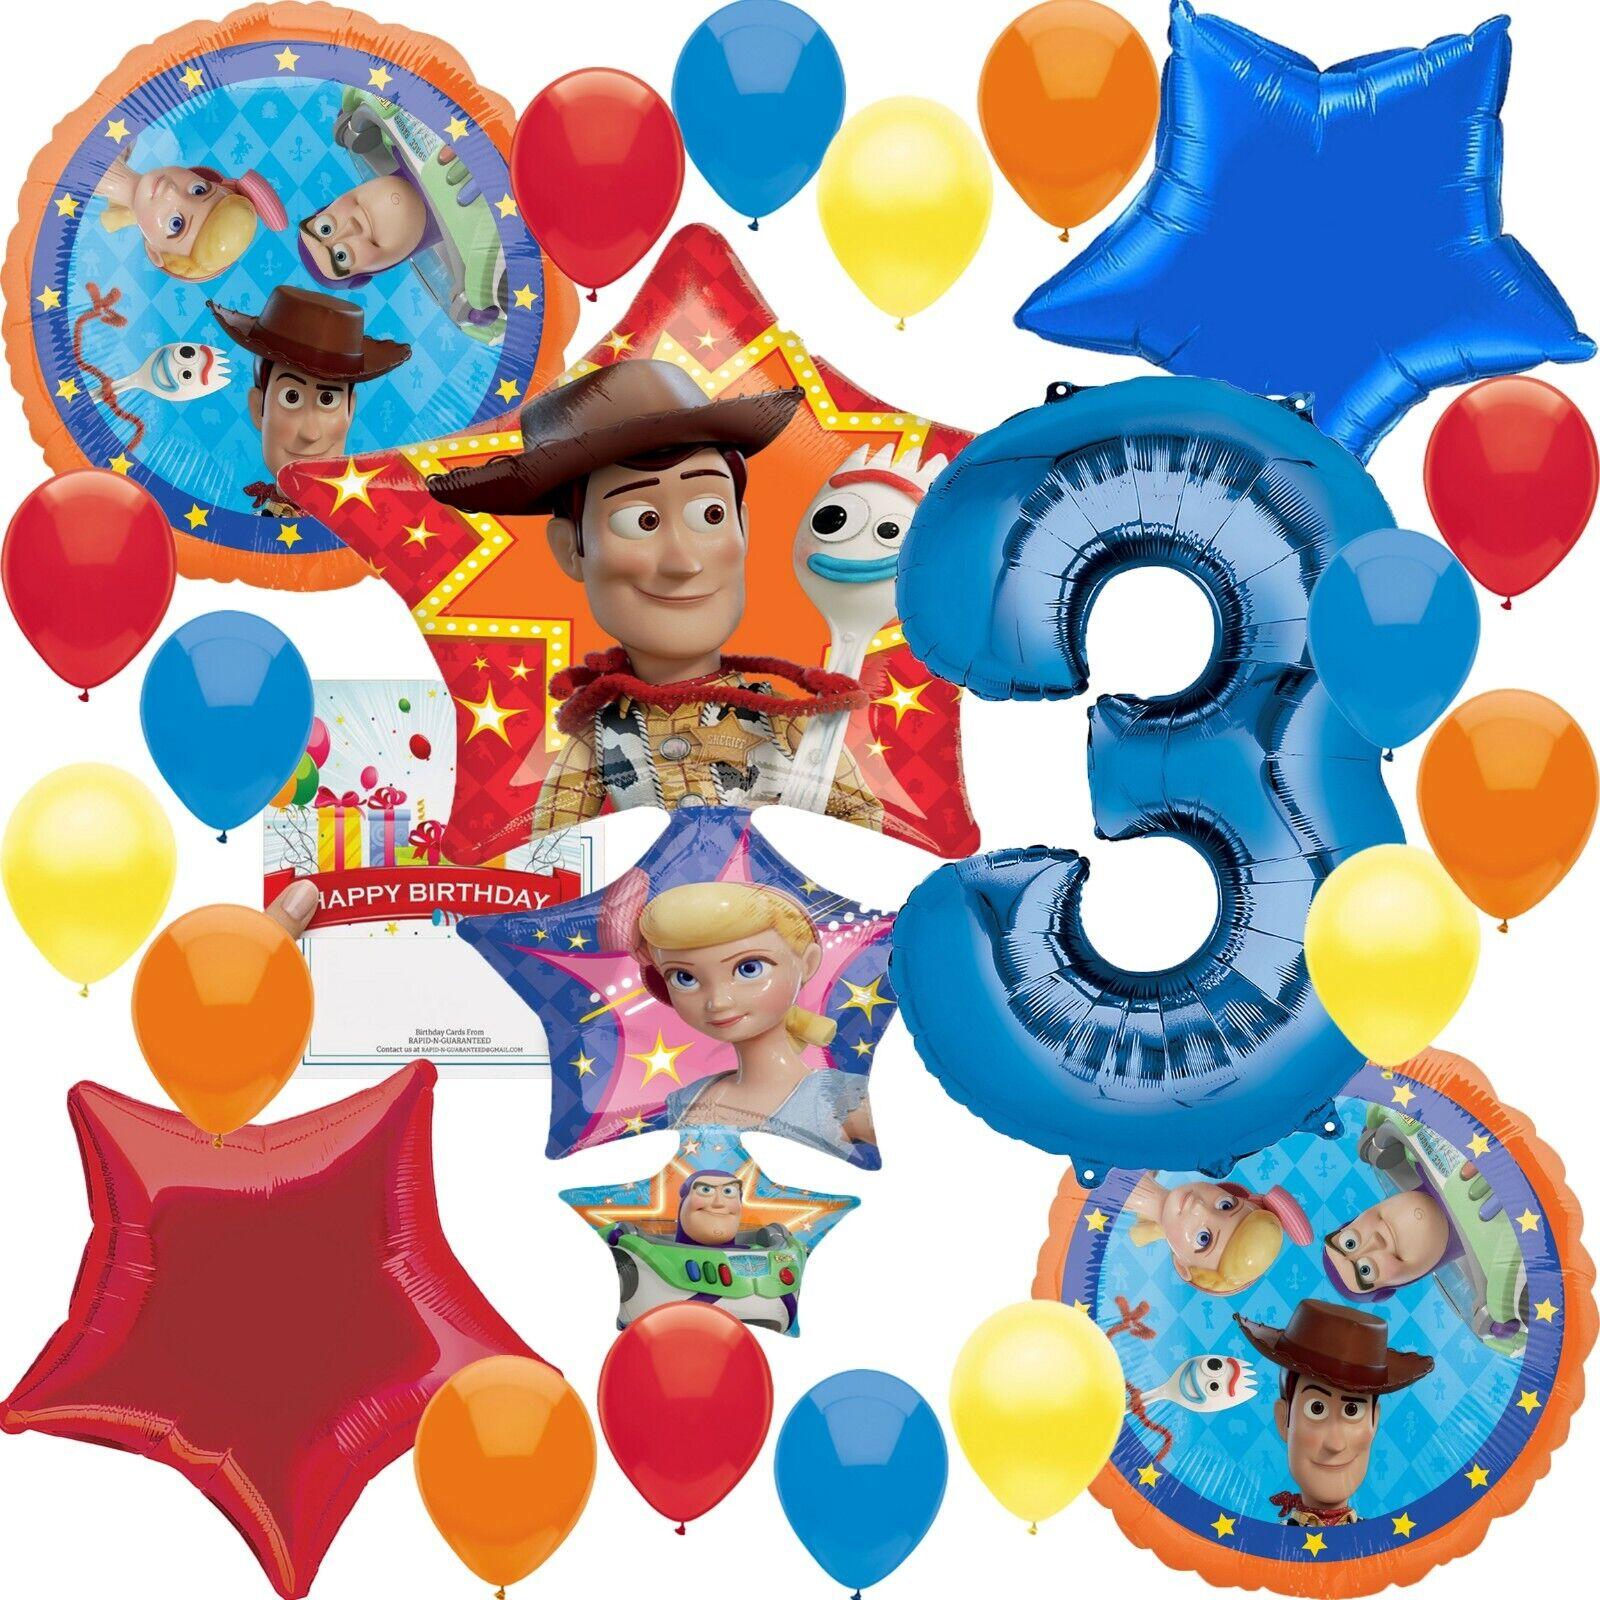 Disney Toy Story 4 Party Supplies 3rd Birthday Balloon Decor